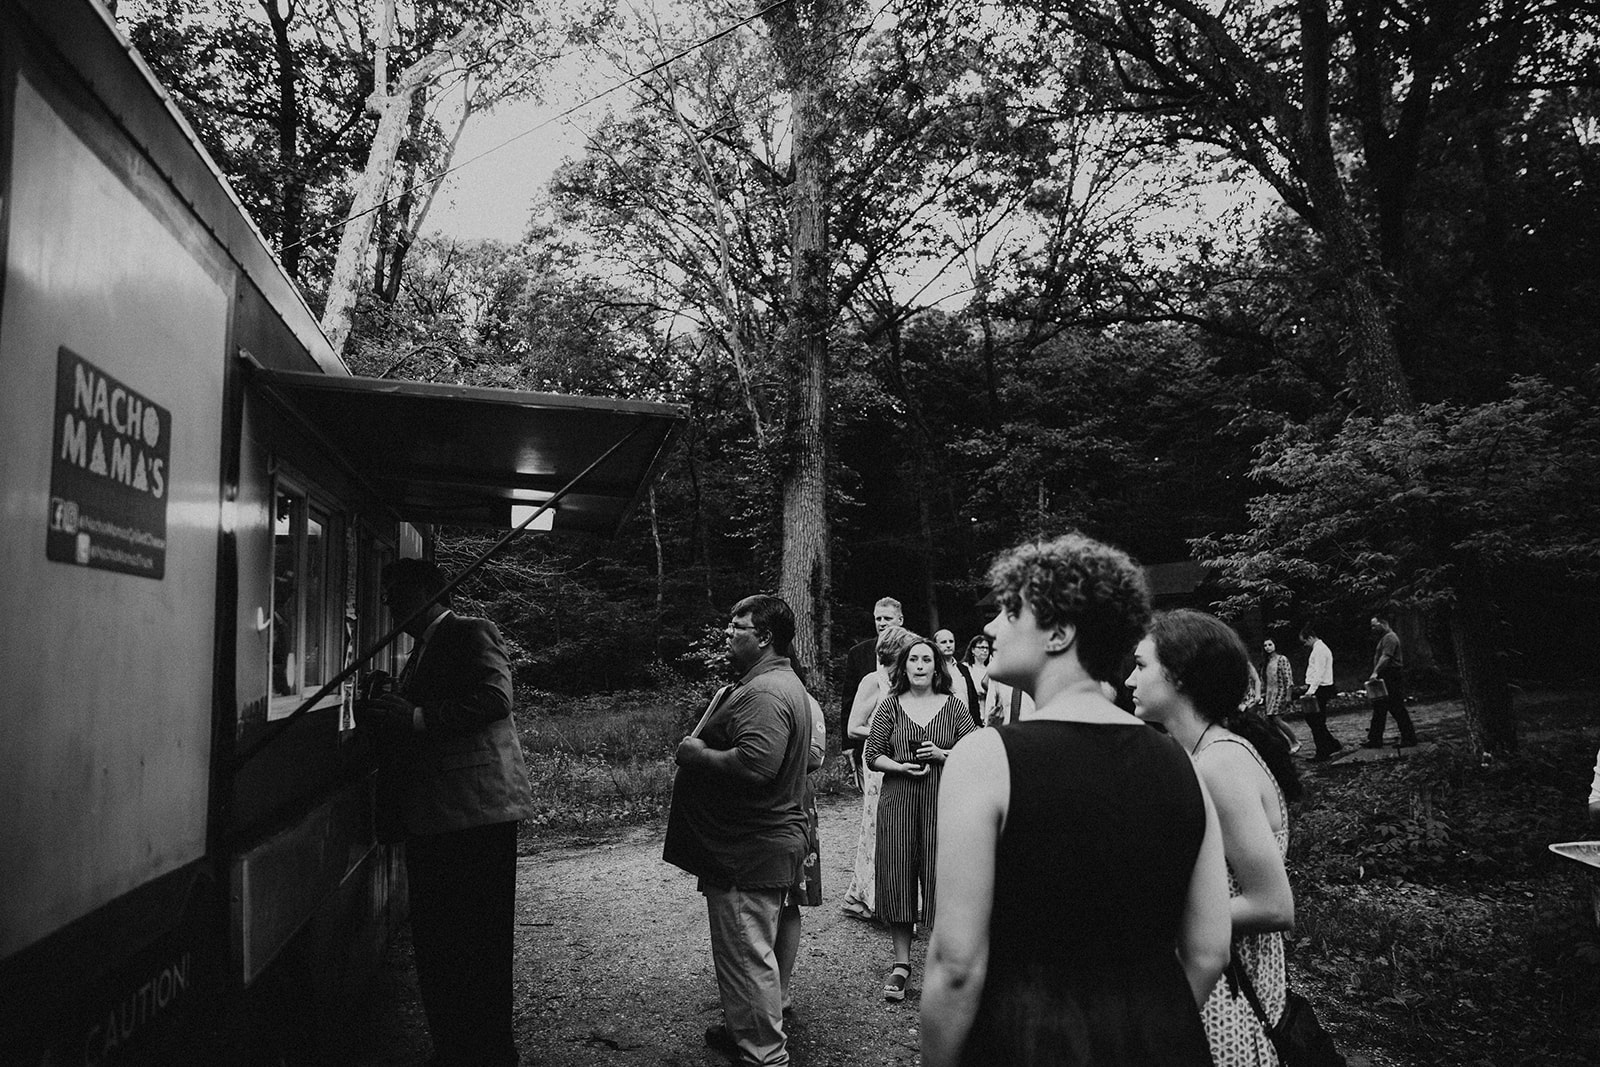 camp_wokanda_peoria_illinois_wedding_photographer_wright_photographs_bliese_0883.jpg